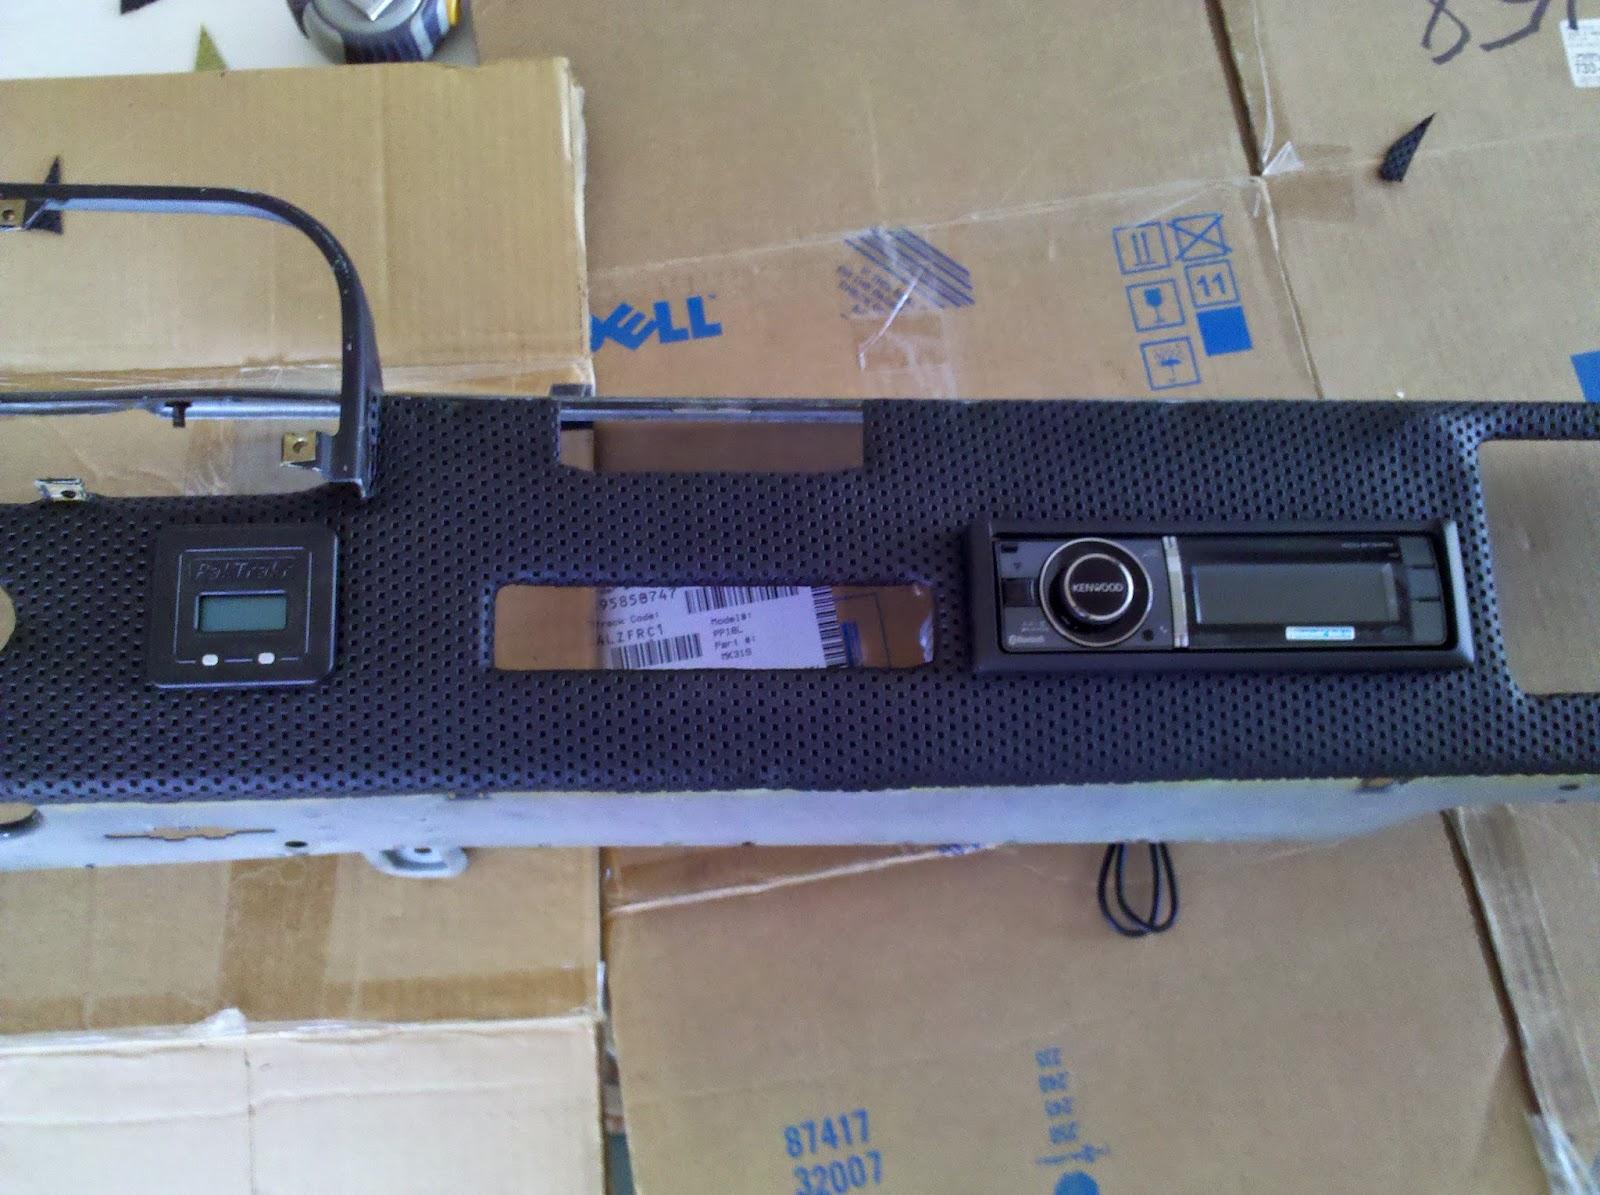 Vp To Vs Dash Conversion Wiring Helphazplugjpg